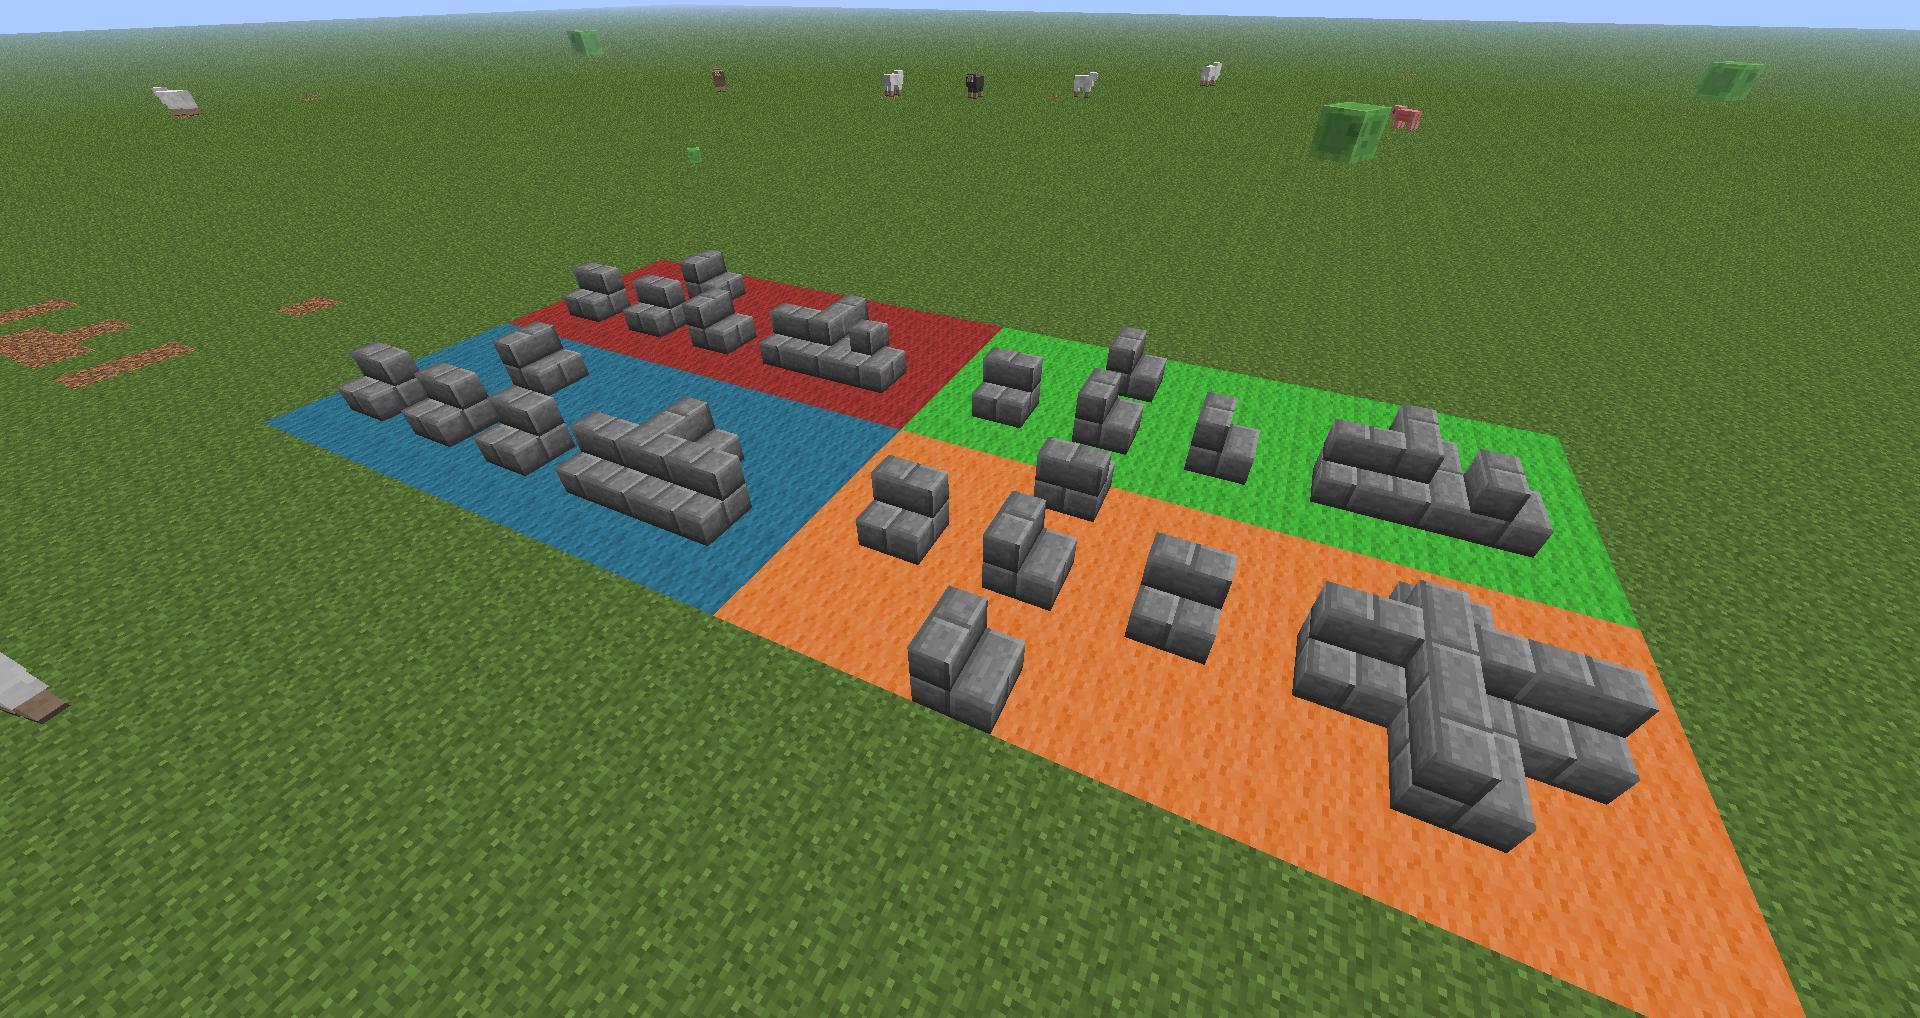 Minecraft Dernires News Minecraft 14 Bientot Les